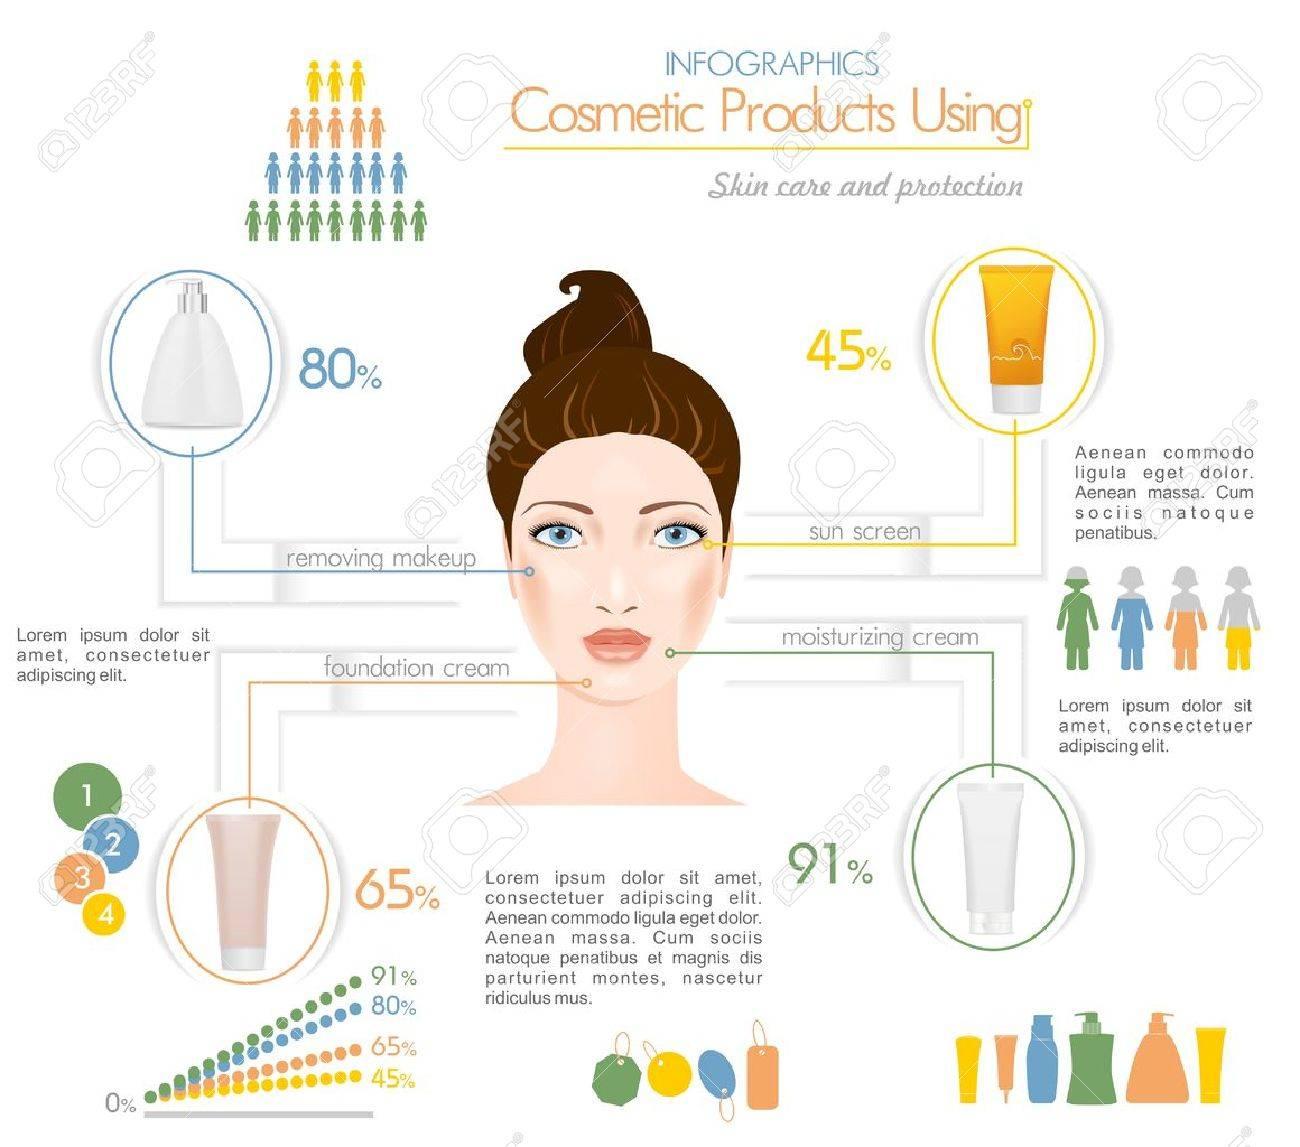 Face creams using infographics. Removing makeup, foundation cream, sun screen, and moisturizing cream. - 40972443